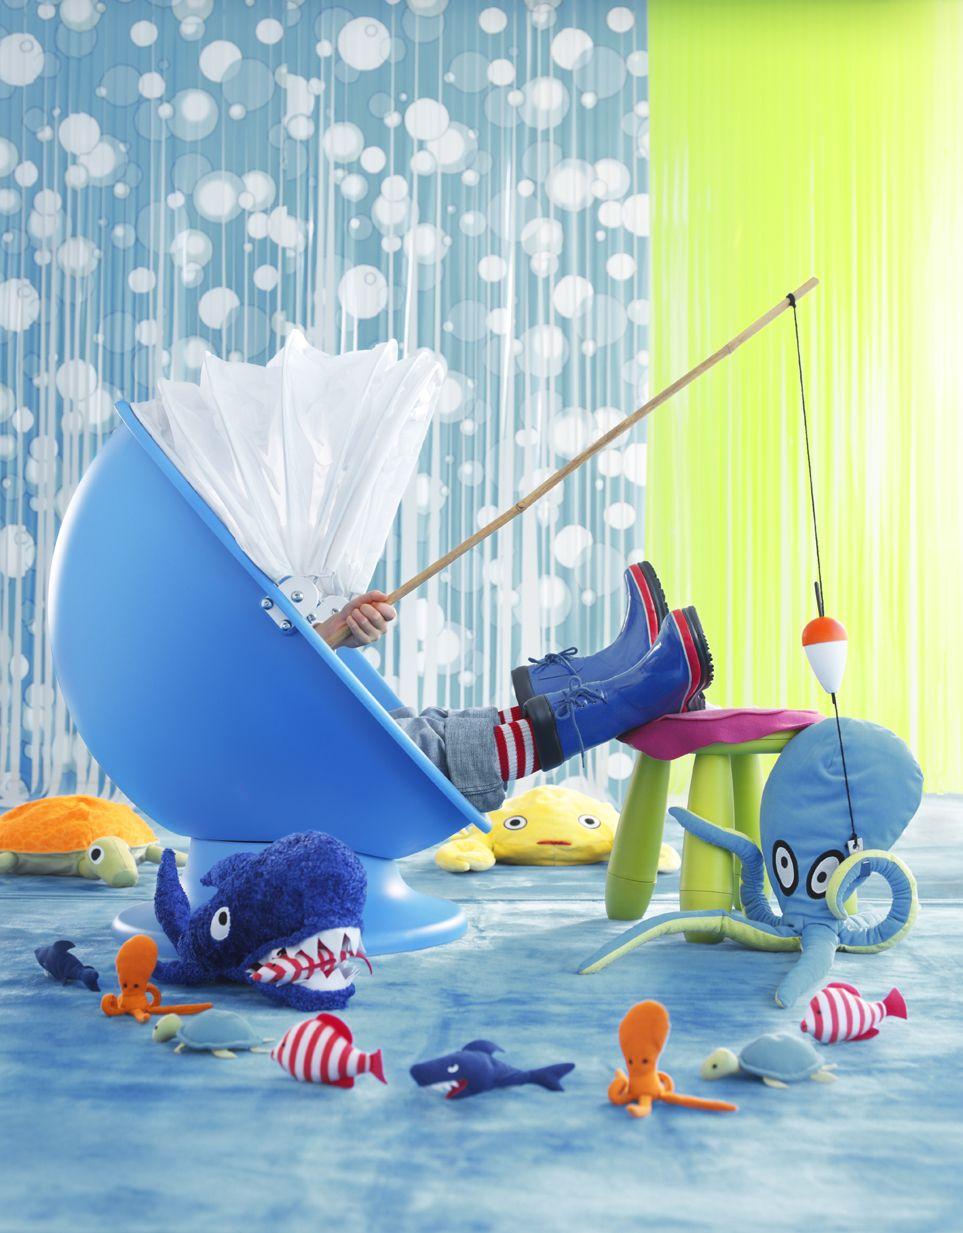 Drehsessel ikea  IKEA Österreich, Inspiration, Kinder, Kids, Drehsessel IKEA/PS ...